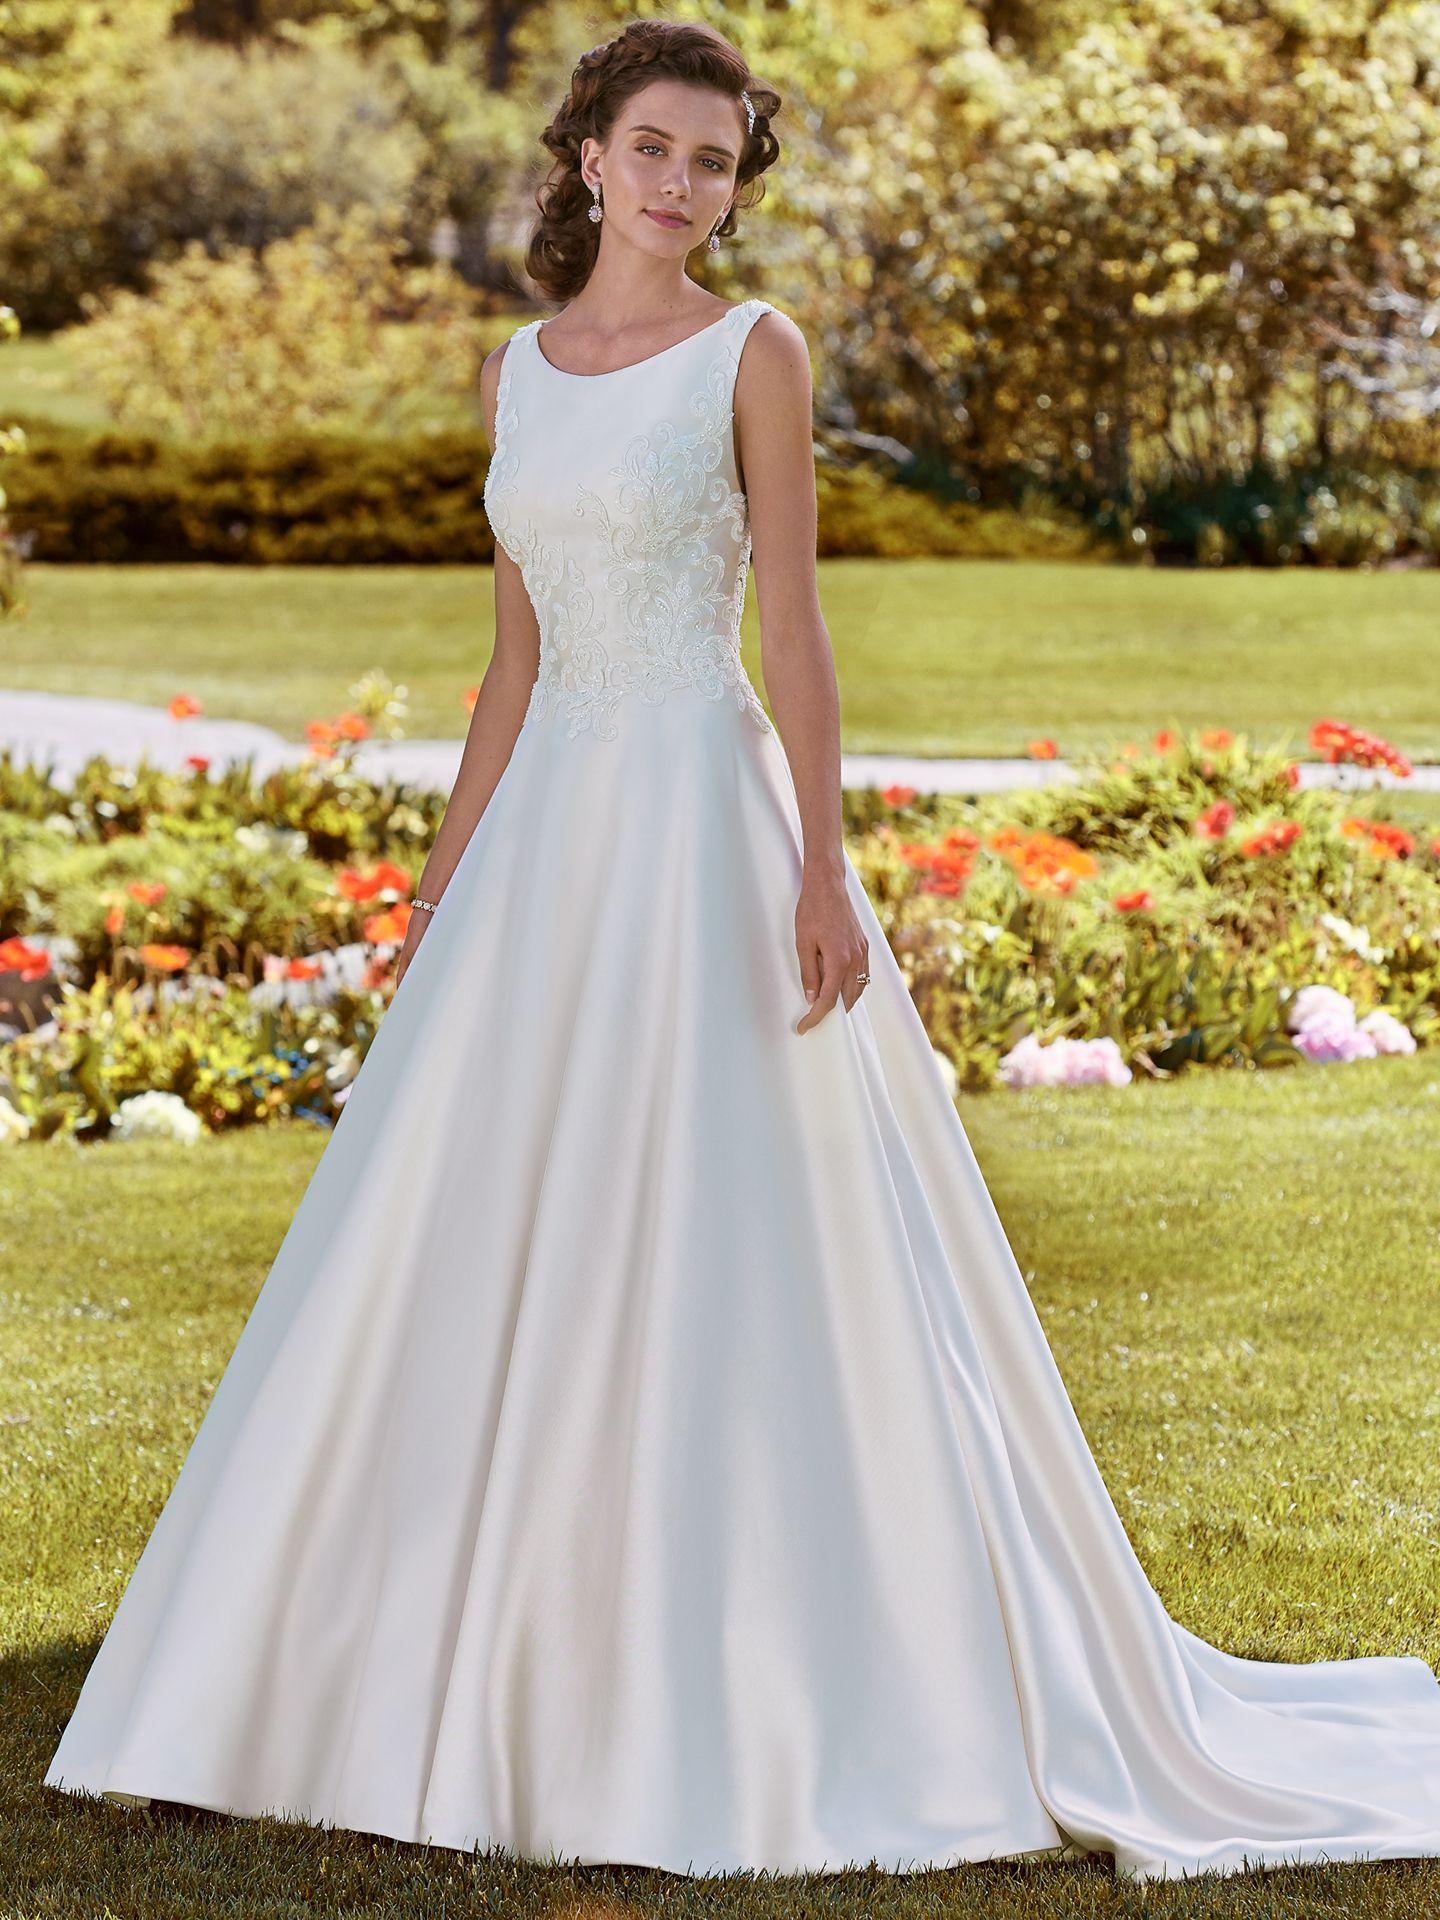 040f3b0dc8b Brooke Wedding Dress Bridal Gown